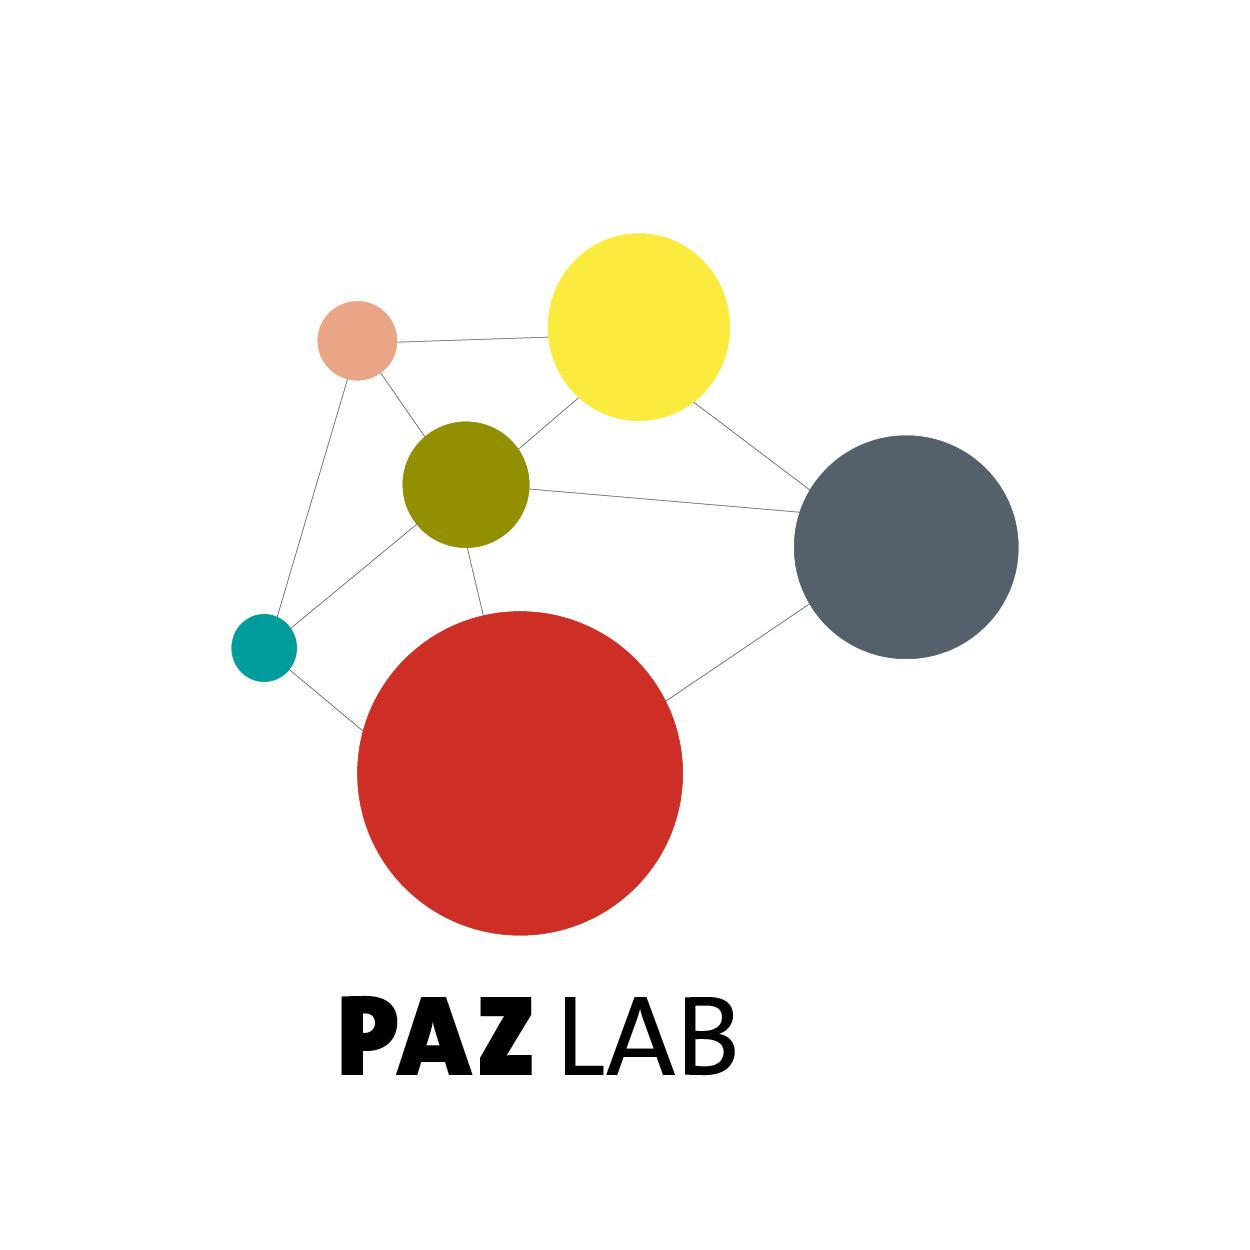 PAZ Labs